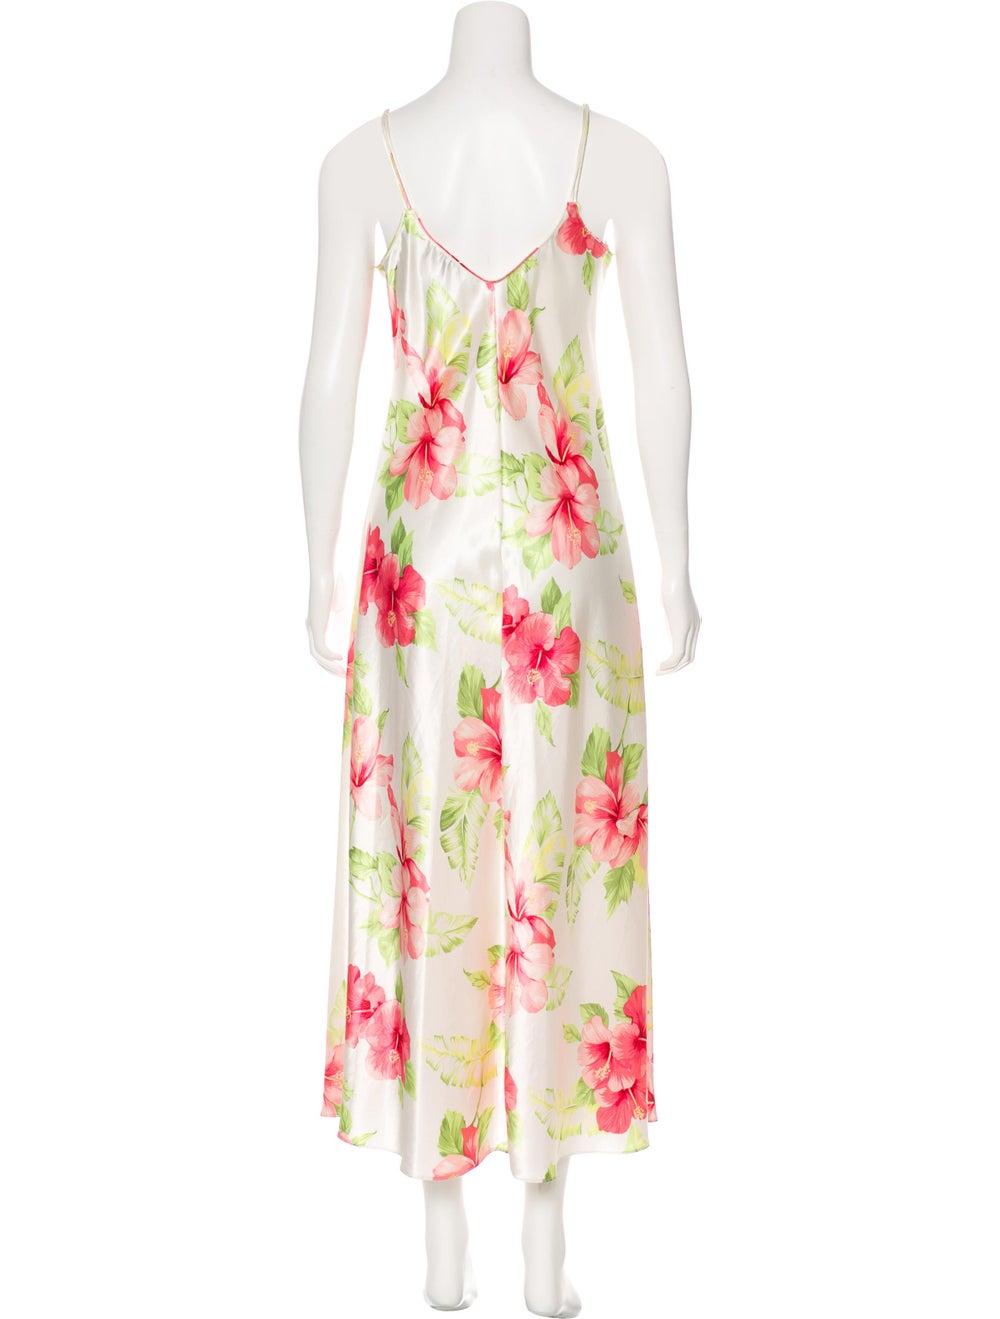 Oscar de la Renta Hibiscus Maxi Dress White - image 3